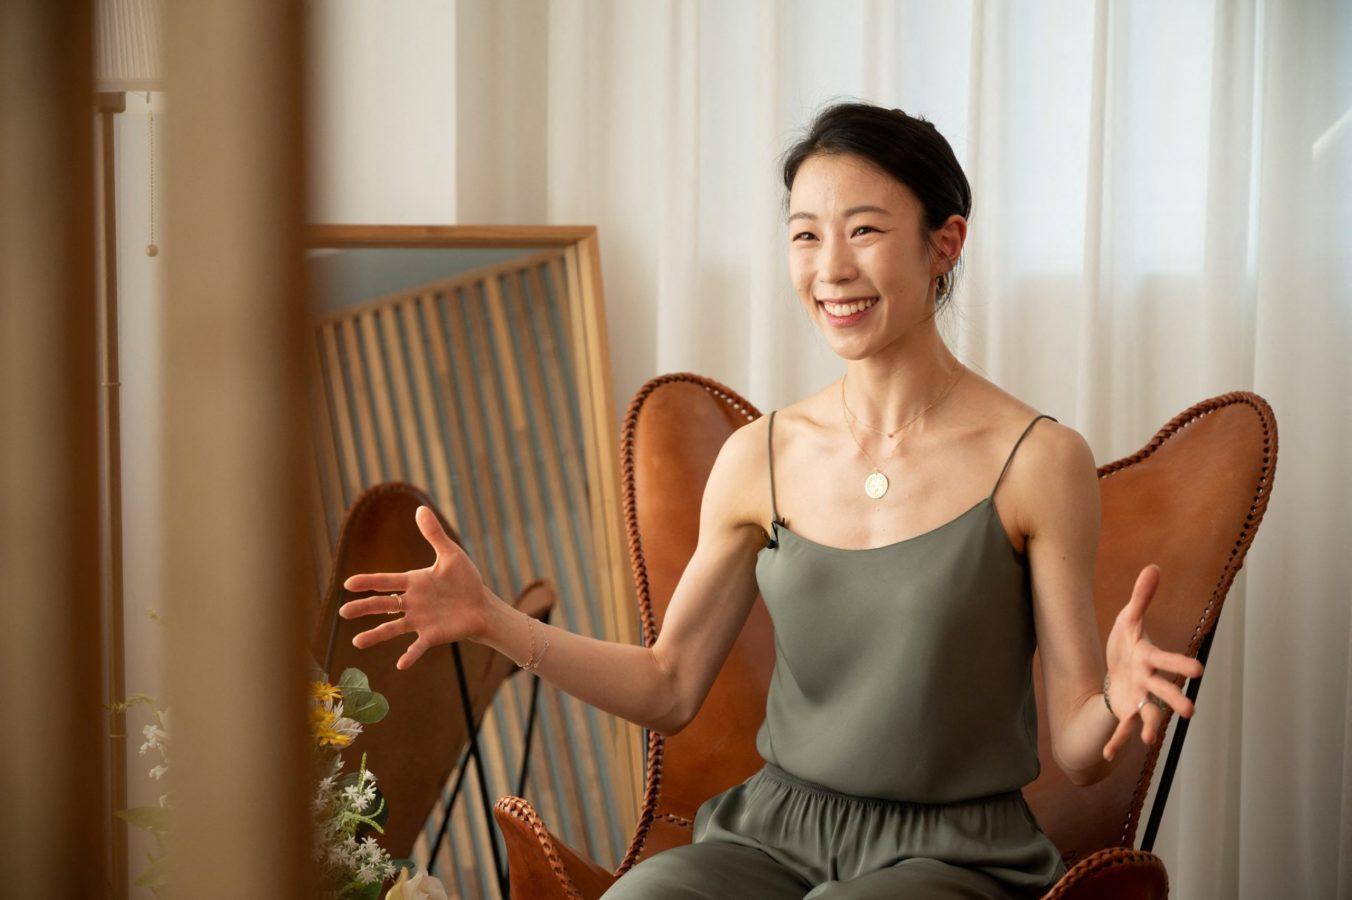 Meet Sae Eun Park, Paris Opera Ballet's first Asian etoile ballerina